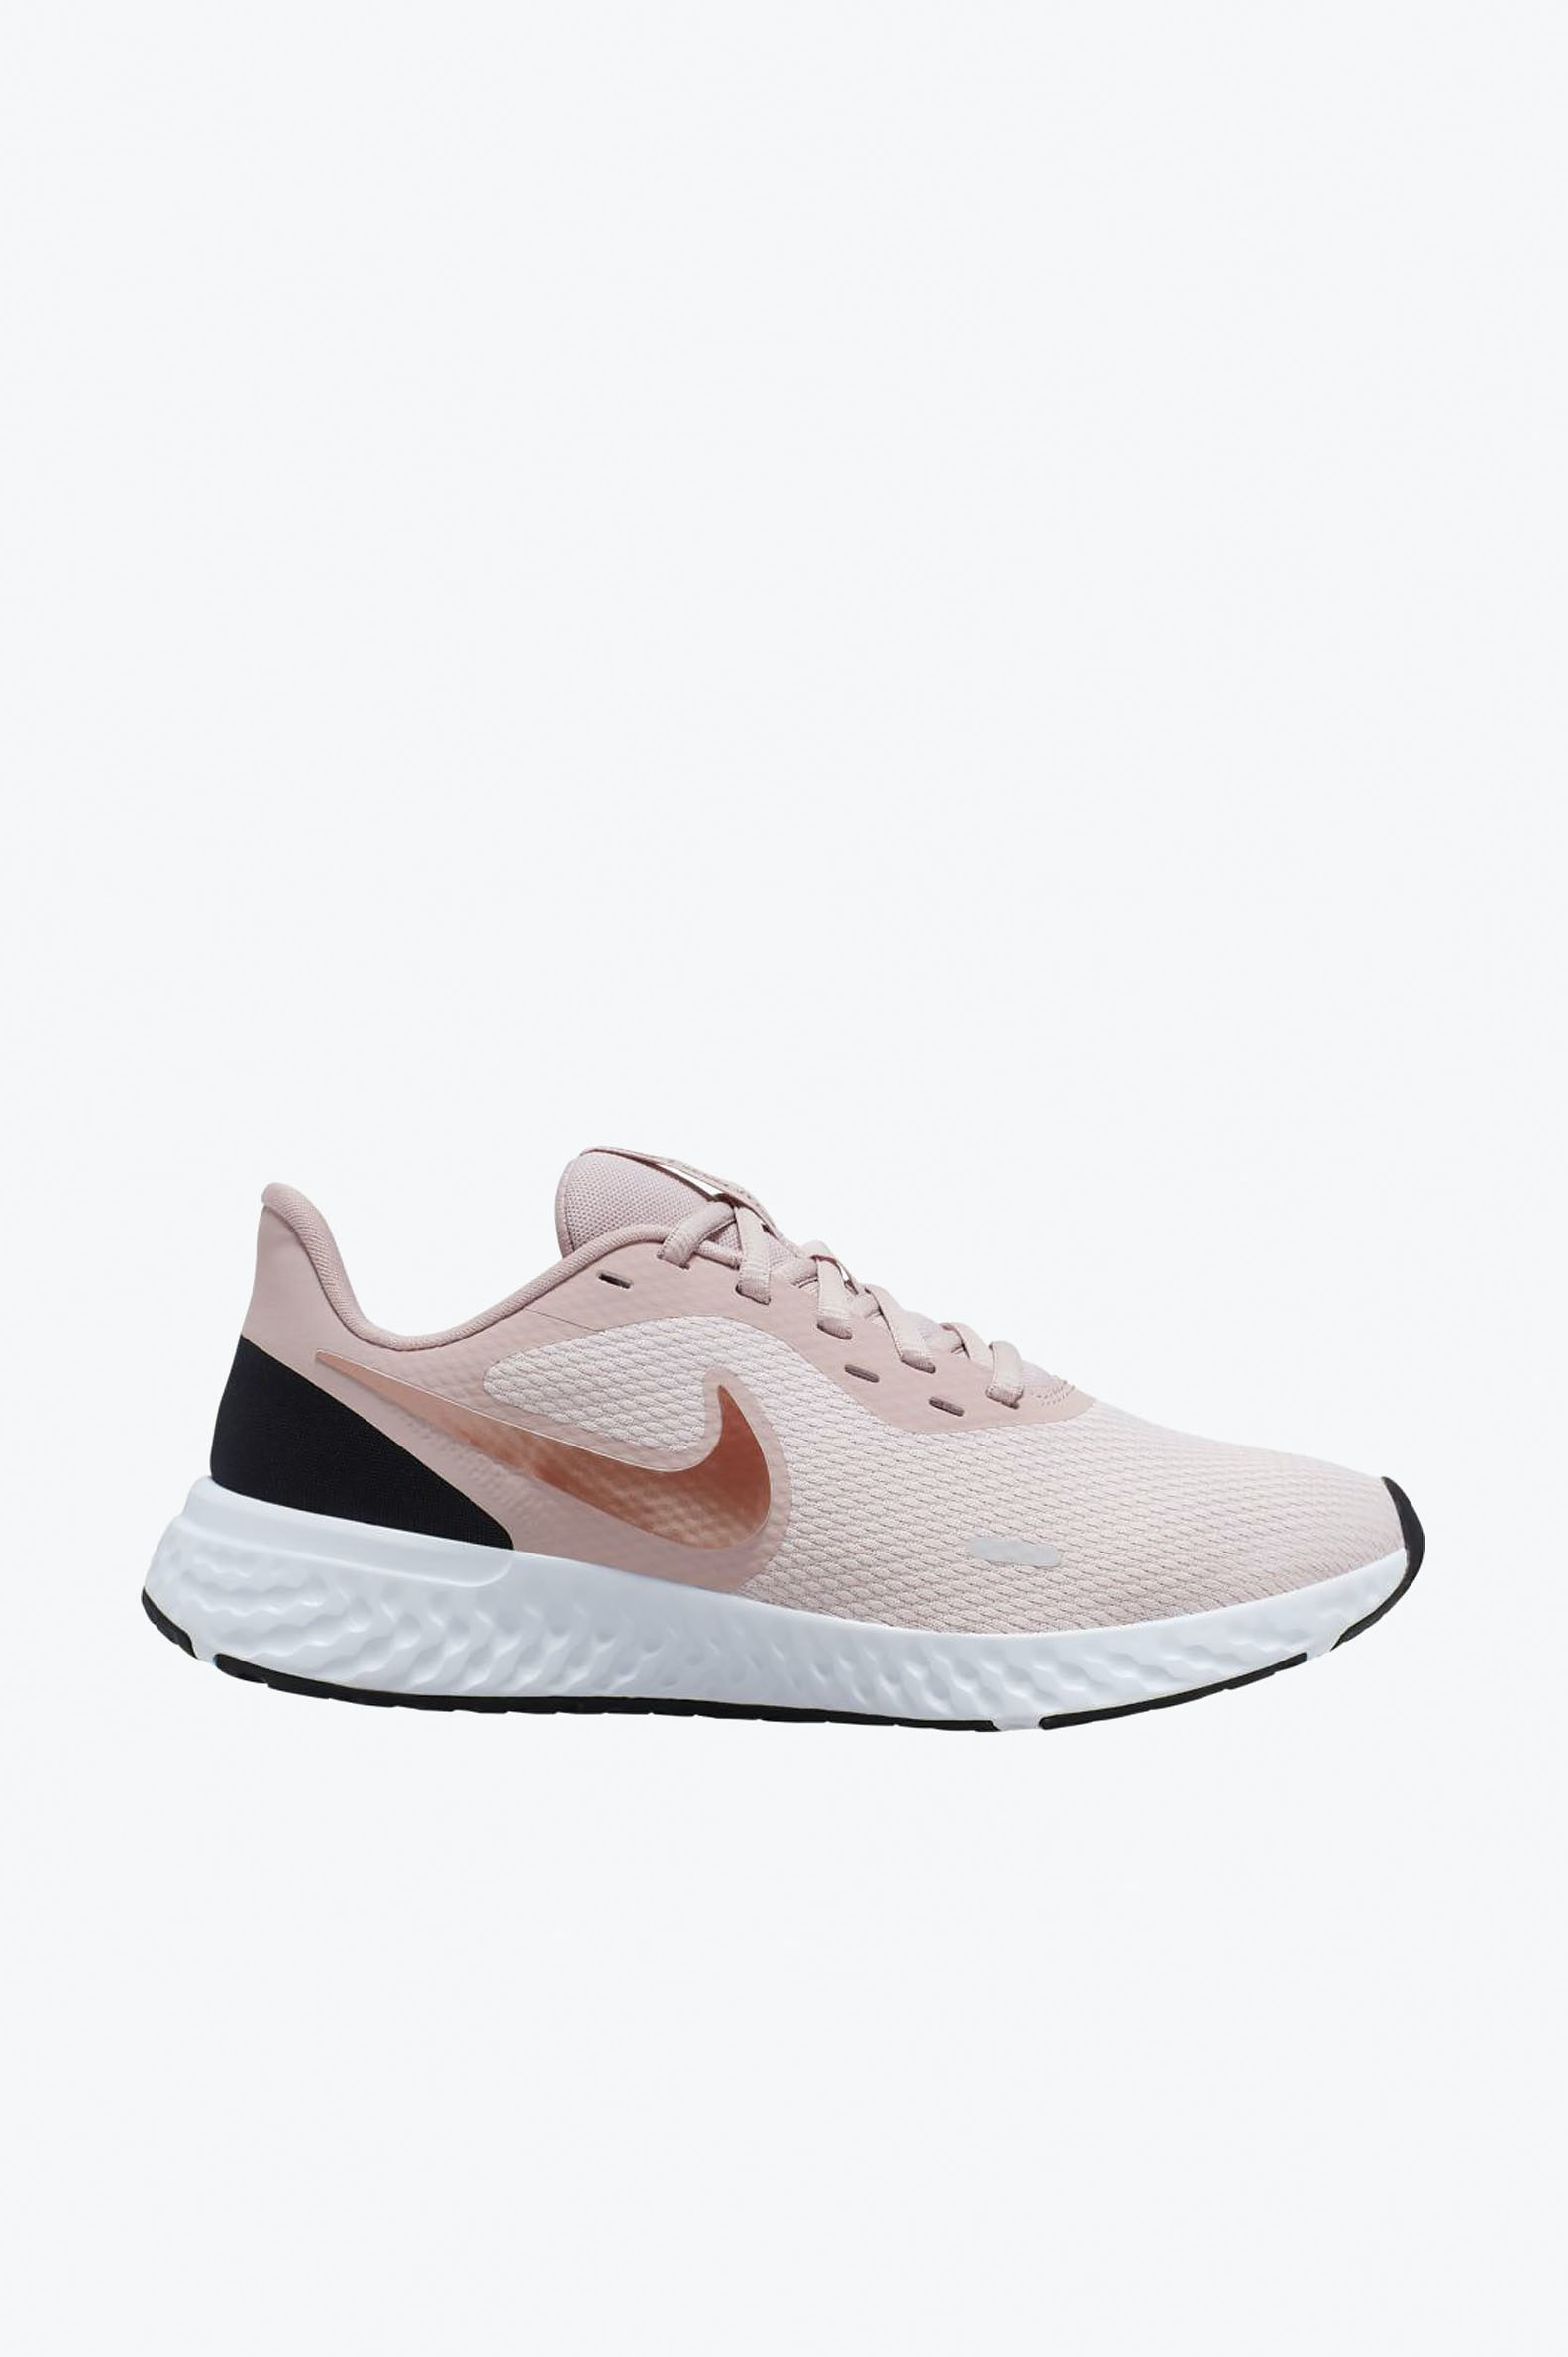 Chaussures running nike revolution femme